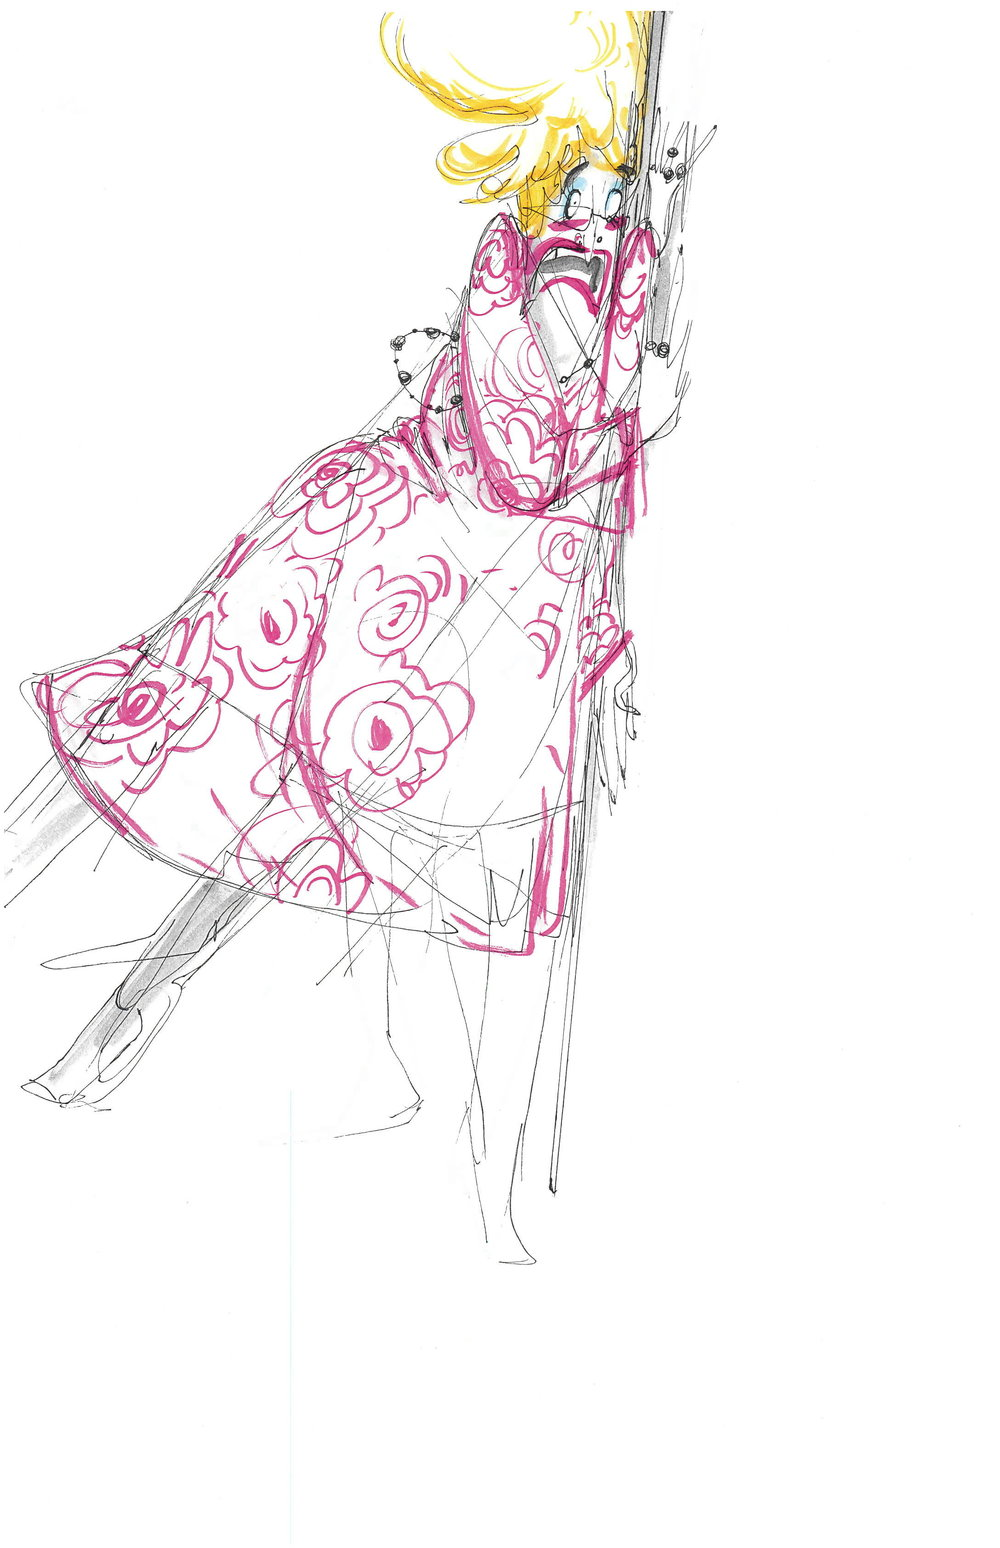 BRIANWONDERS-sketches-1_Page_10_Image_0001.jpg